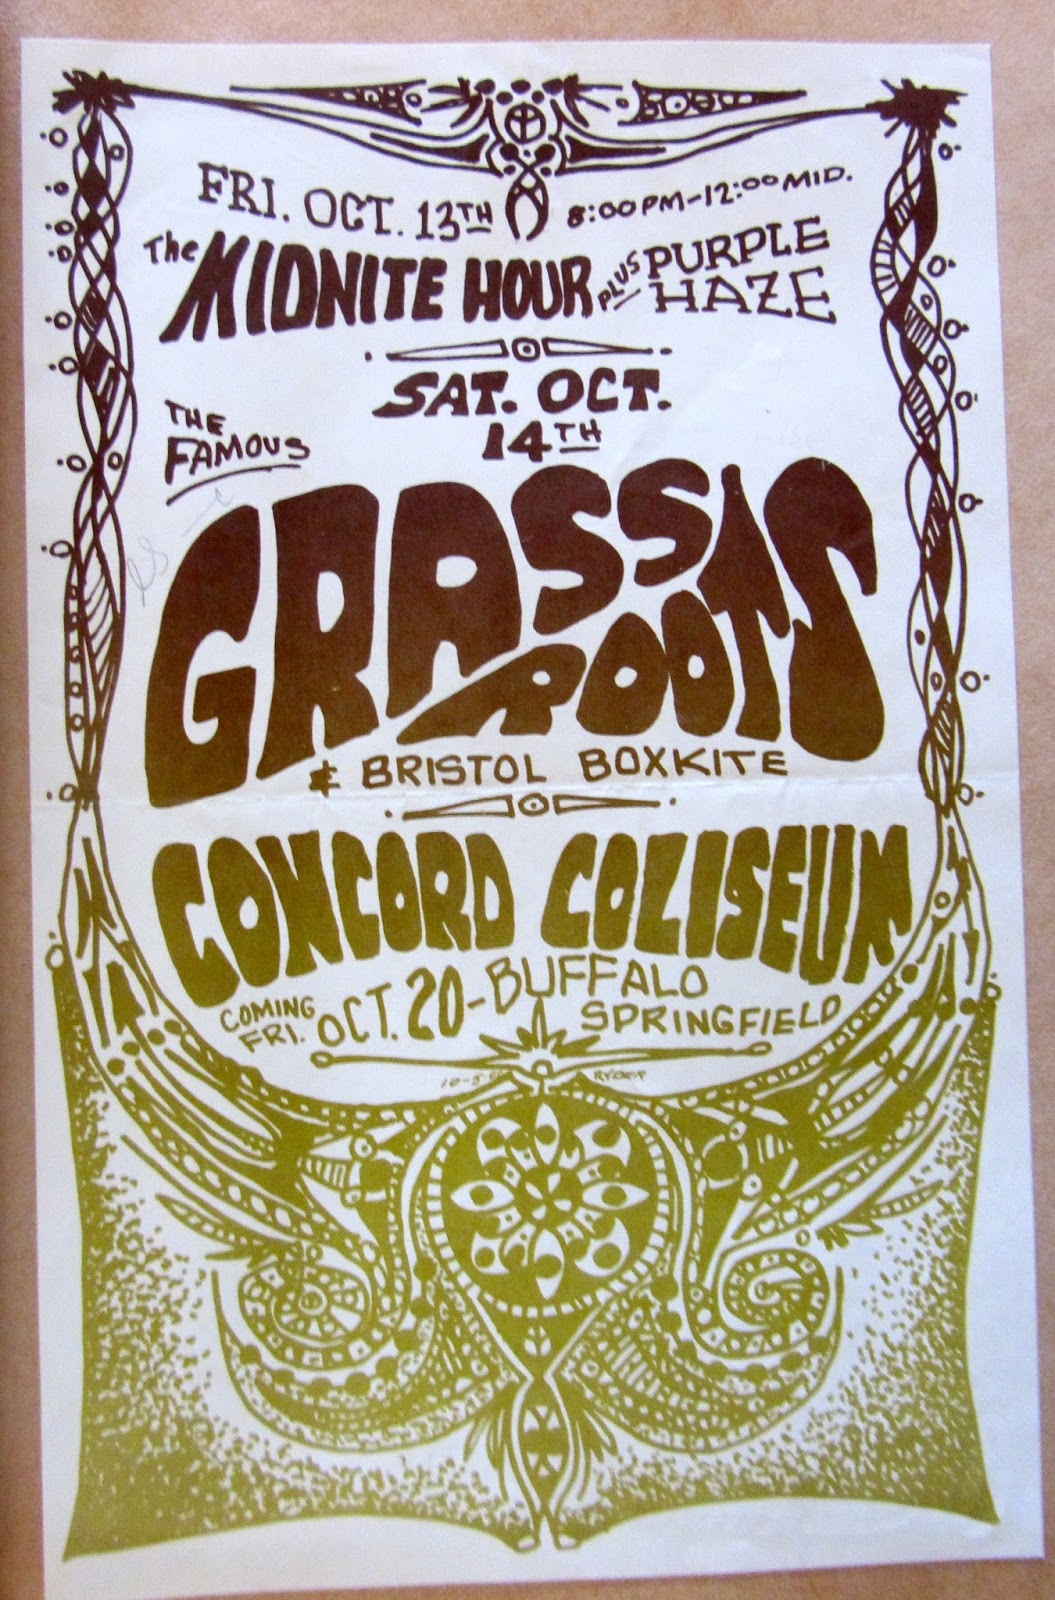 Rock Prosopography 101 1825 Salvio Street Concord Ca Concord Coliseum Performances 1967 68